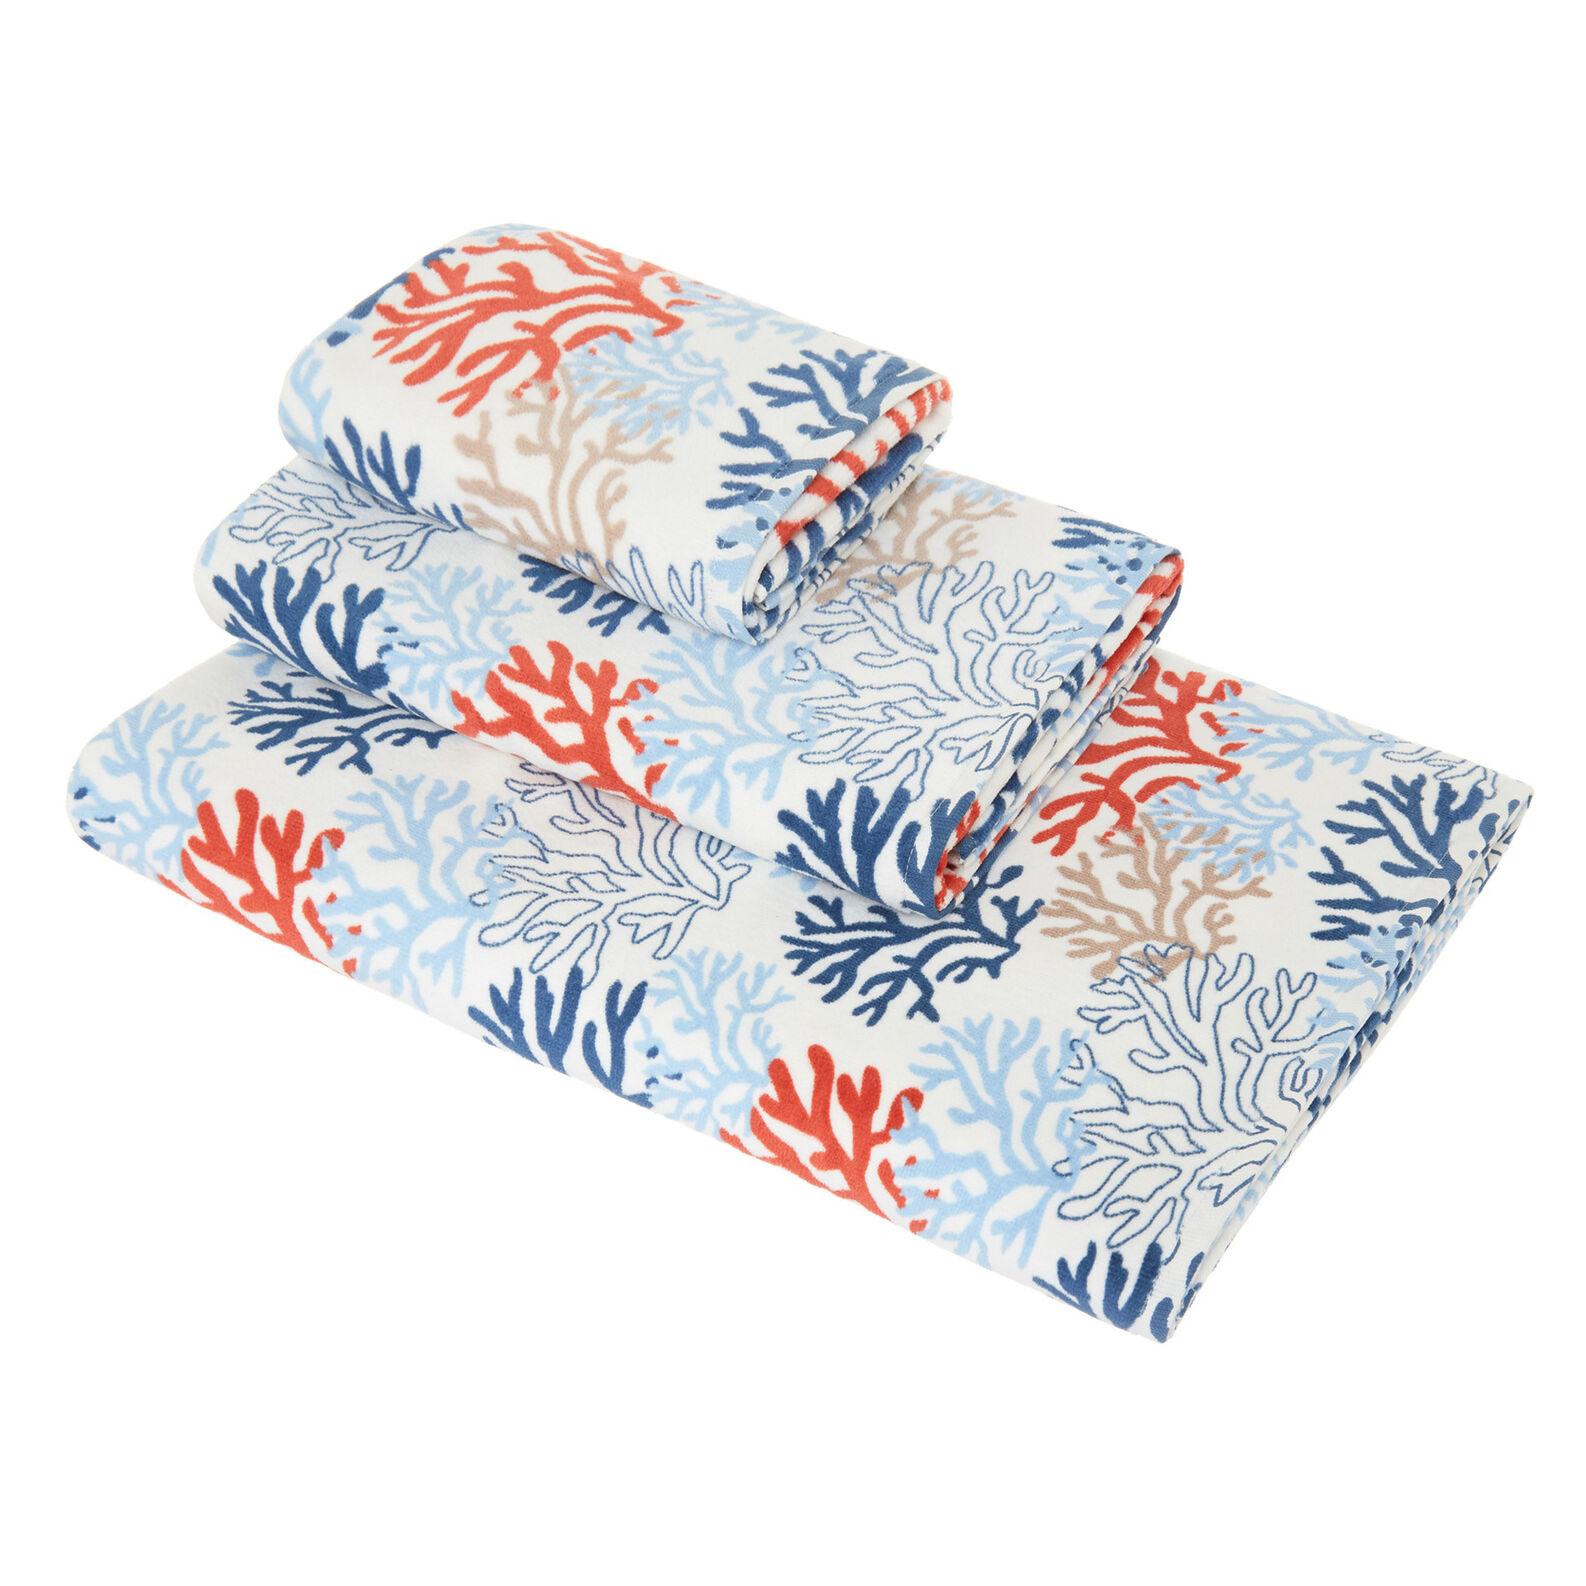 Velour cotton towel with coral motif